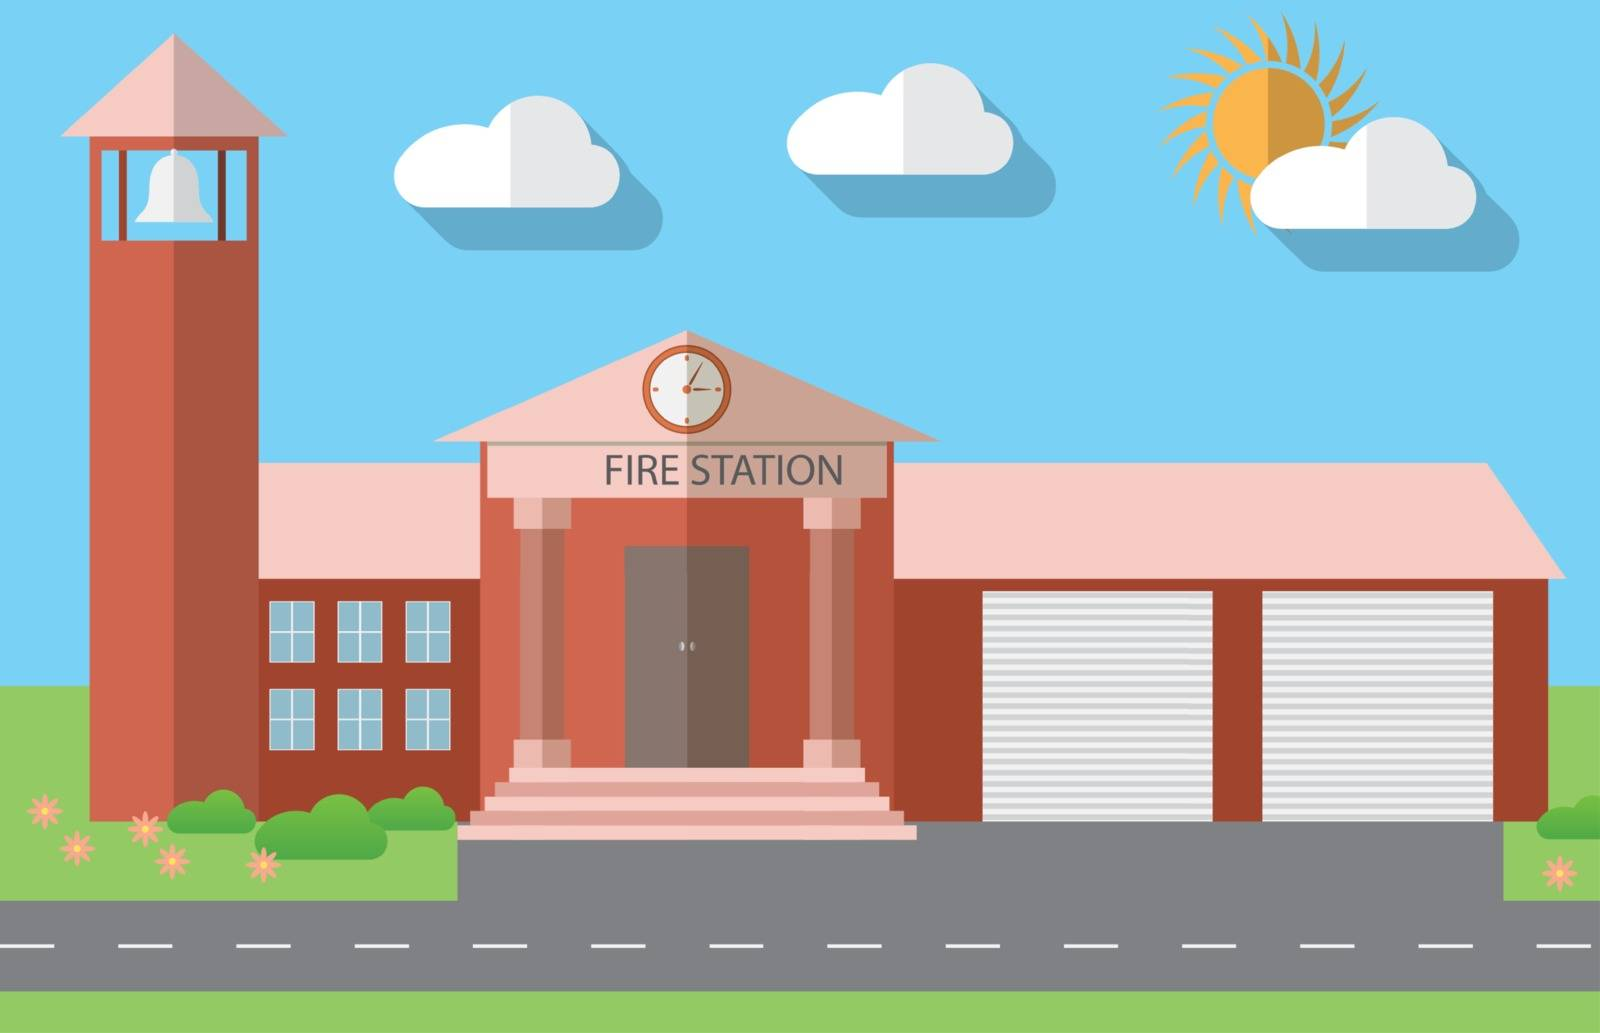 Flat design vector illustration of fire station building in flat design style, vector illustration